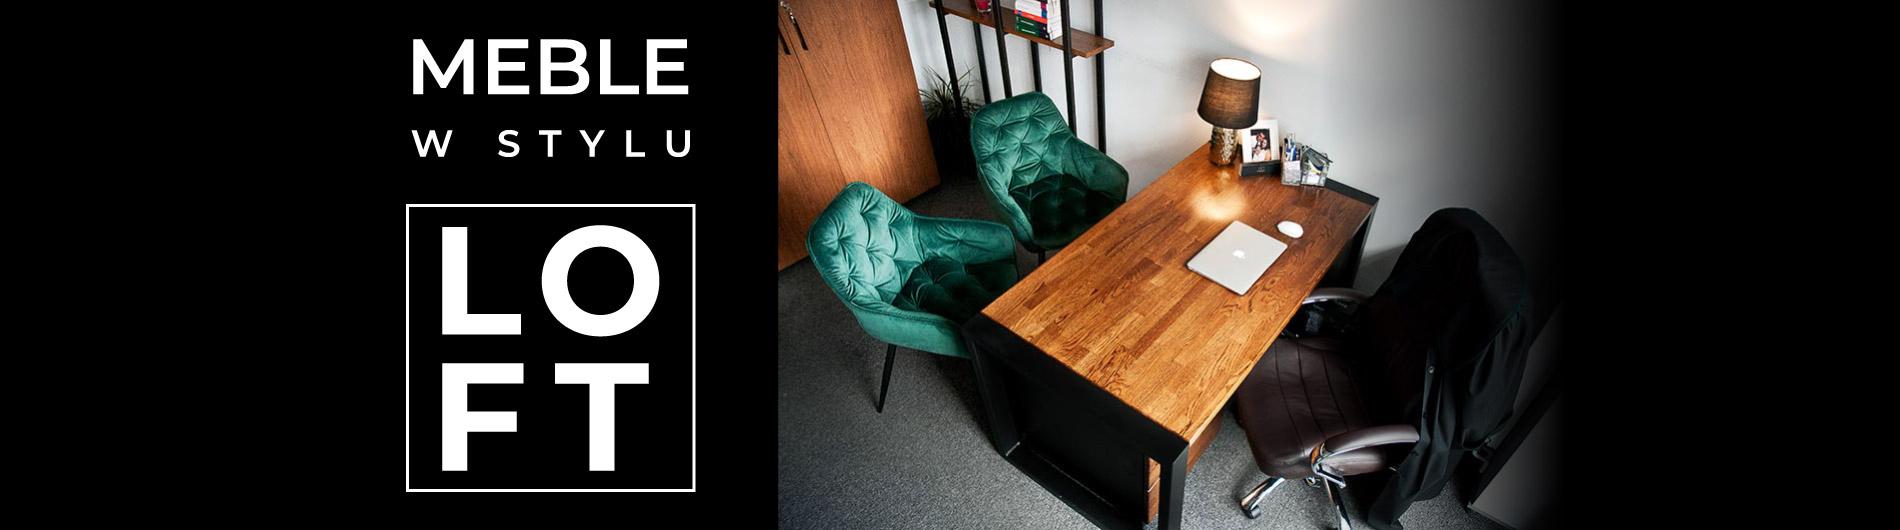 guard-desk-meble-loft